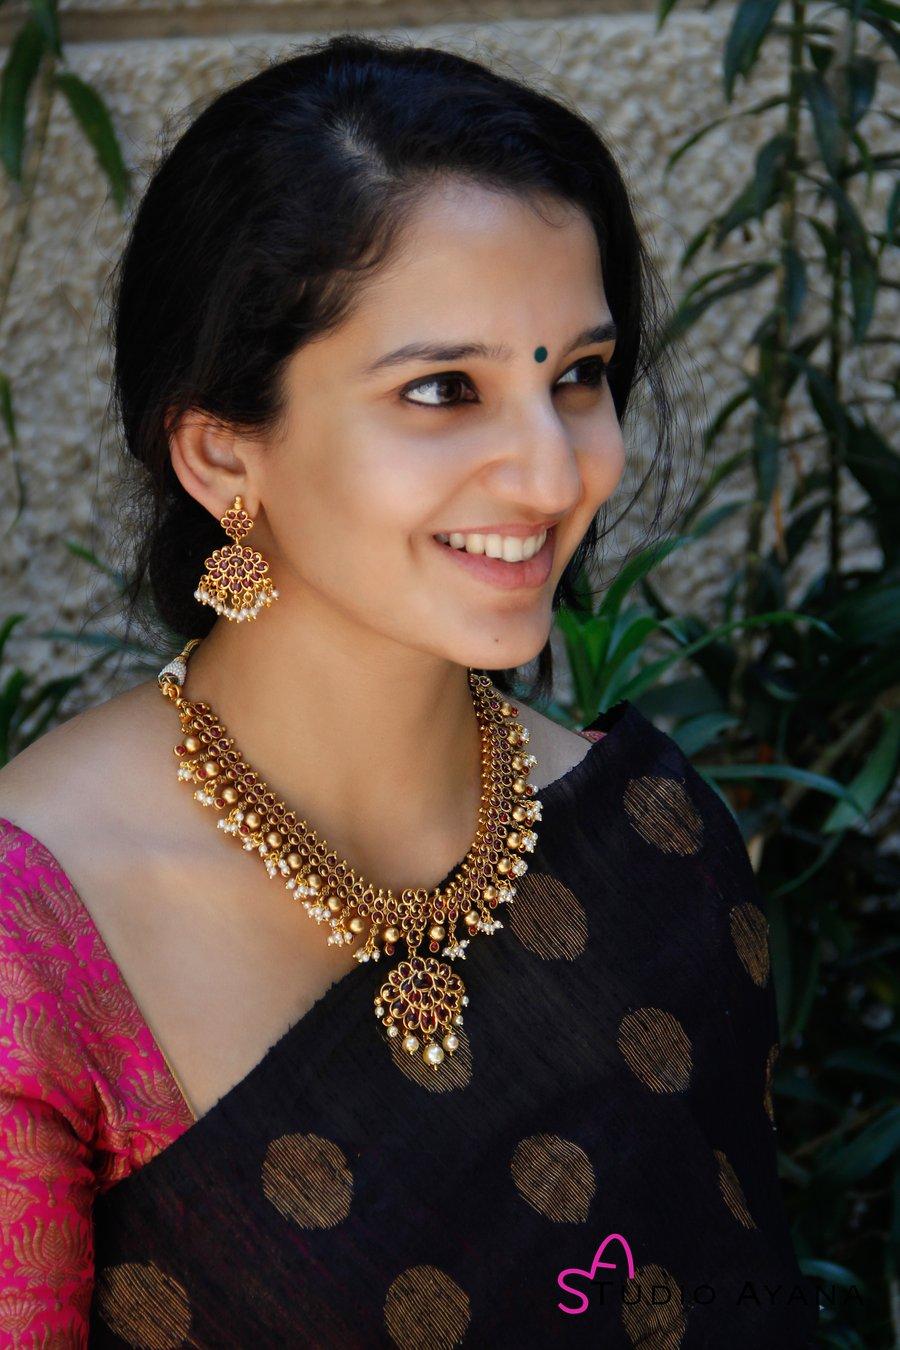 antique-jewellery-designs-2019 (2)